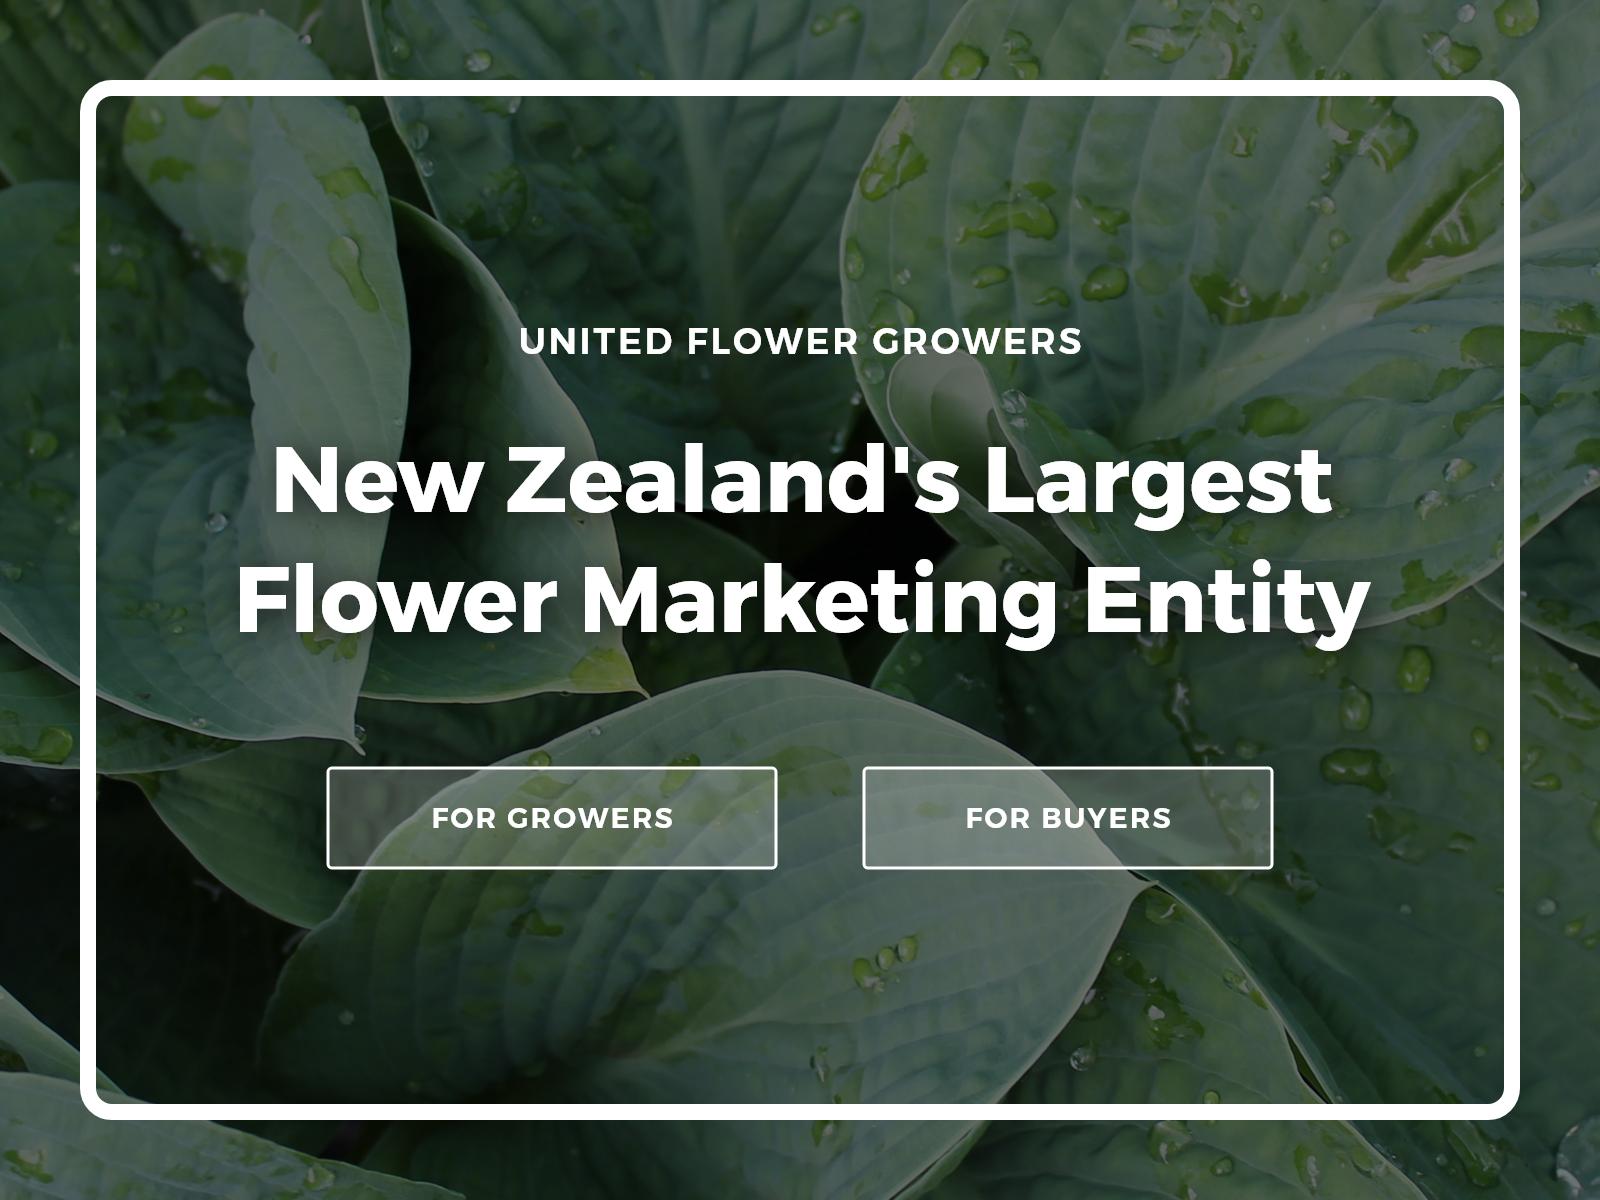 United Flower Growers - Marketing Website & Member Platform